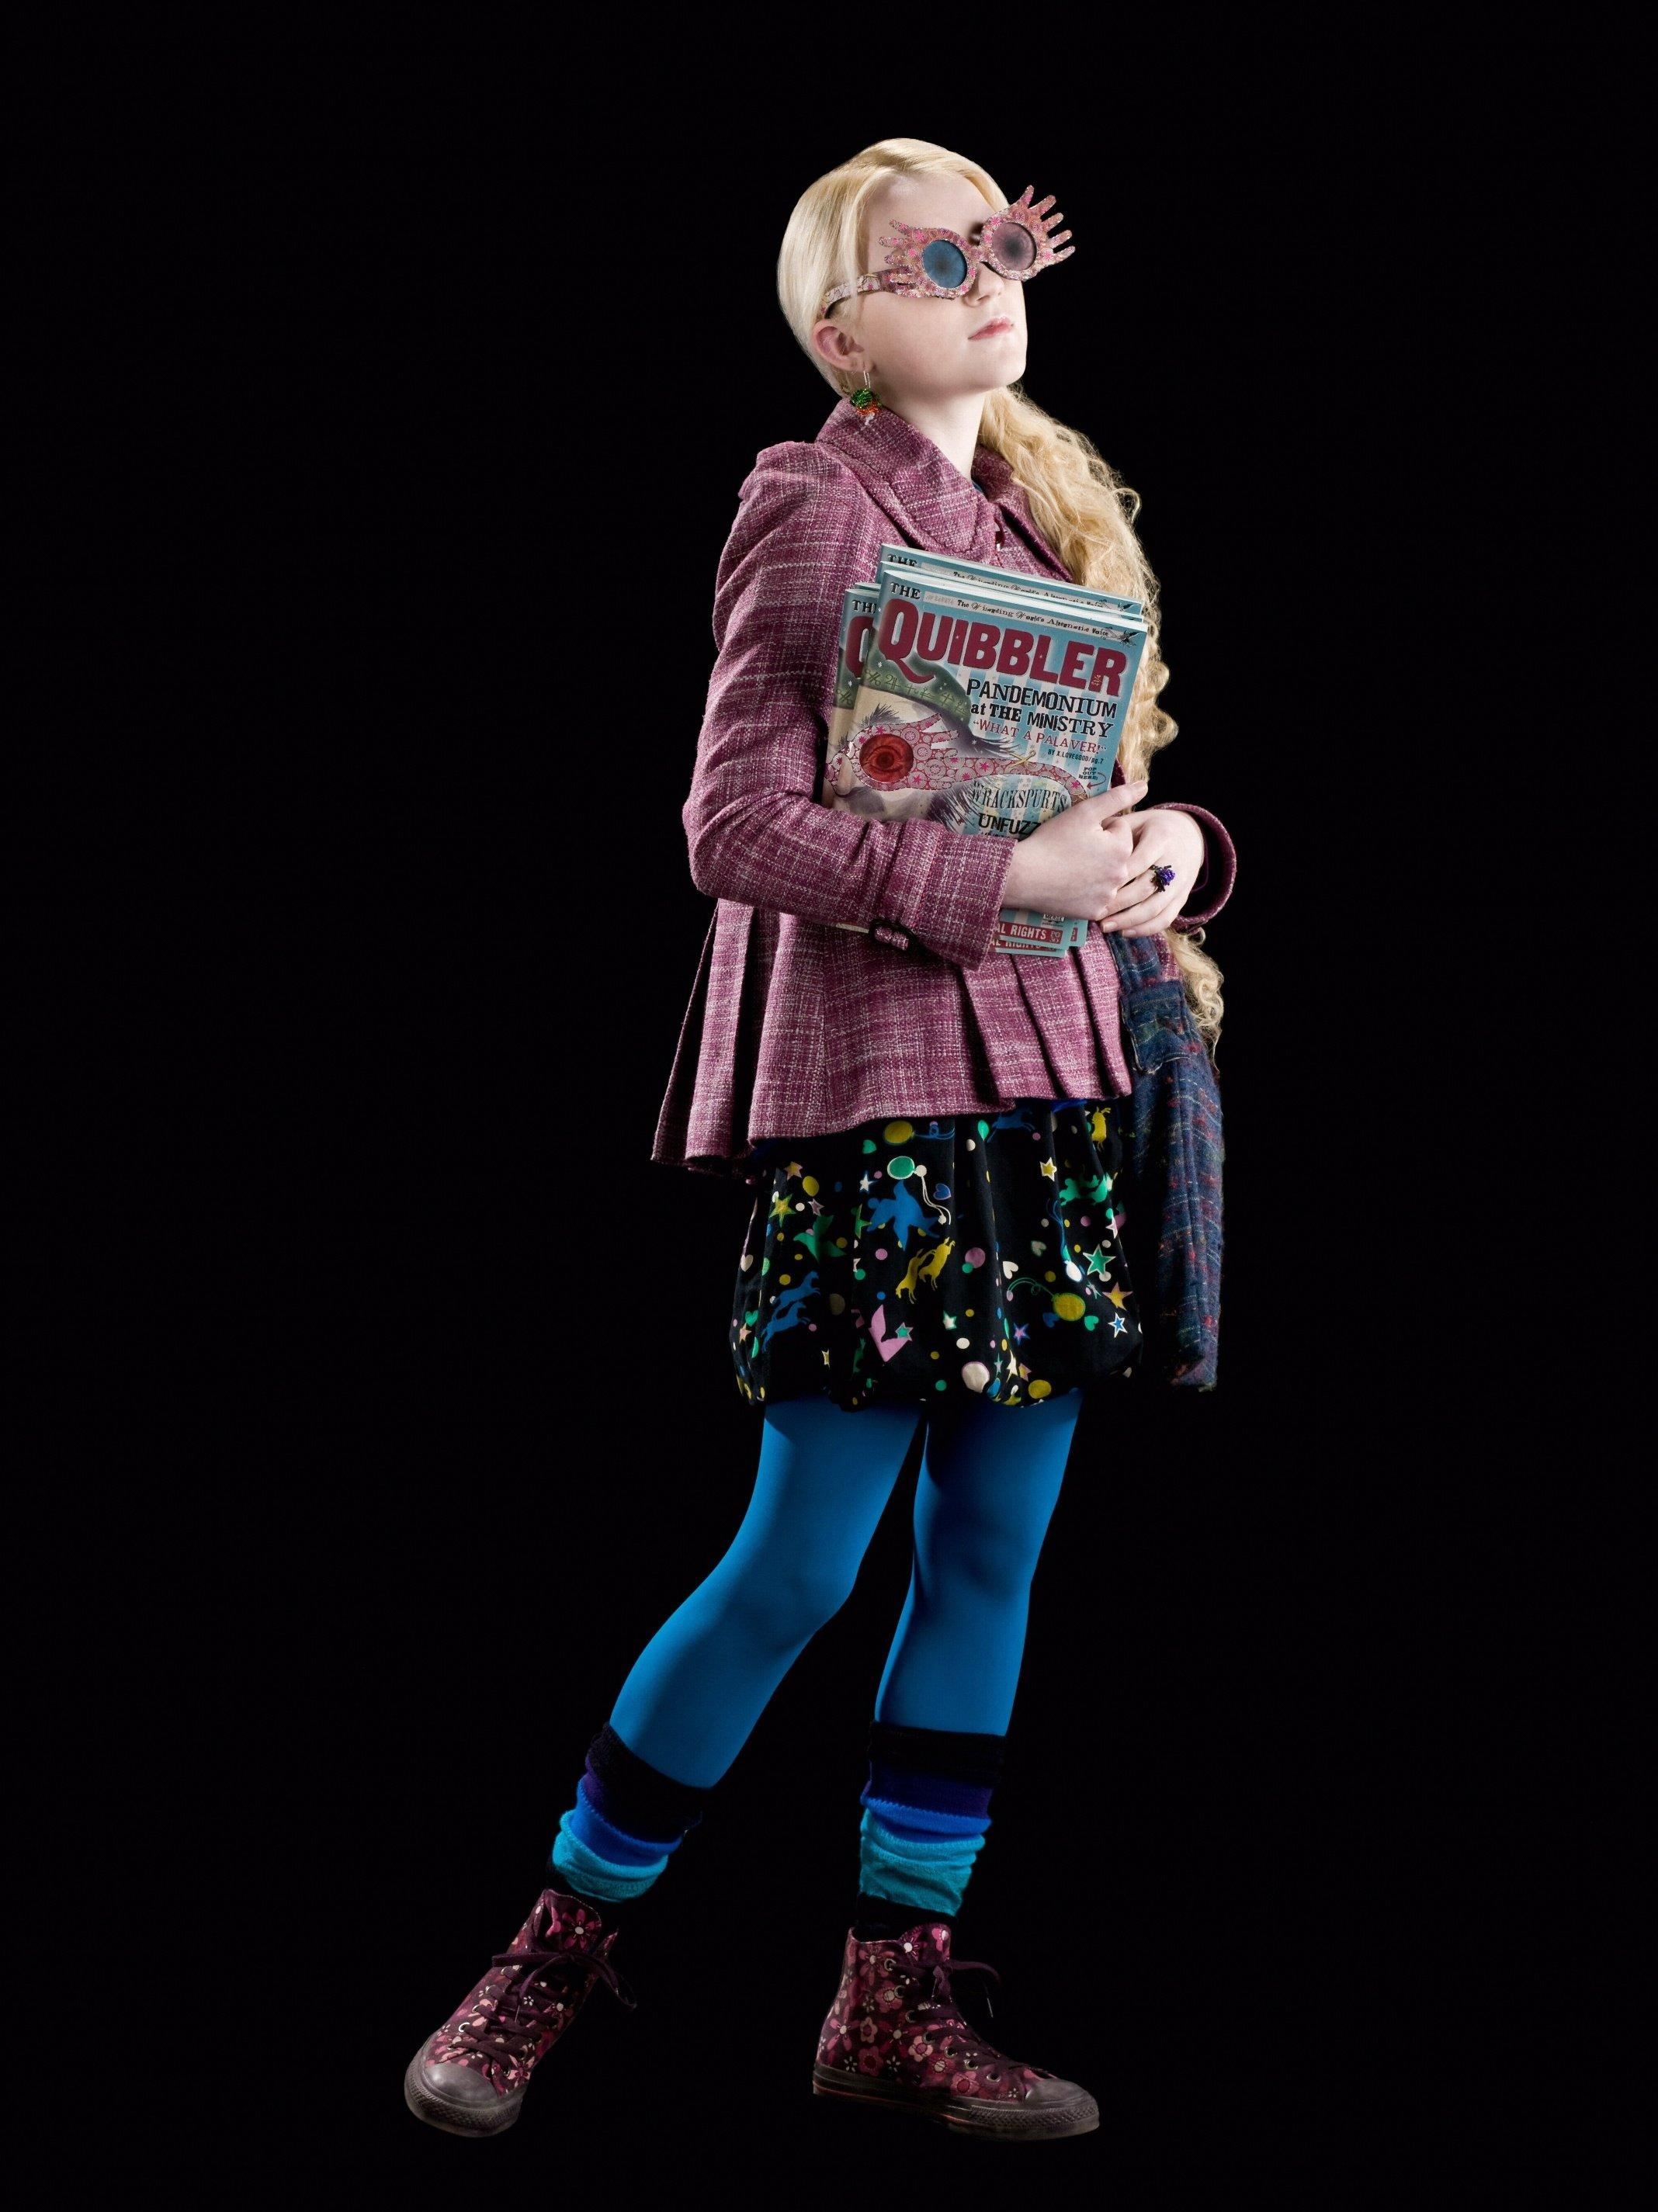 Luna lovegood, School uniforms and Street clothes on Pinterest